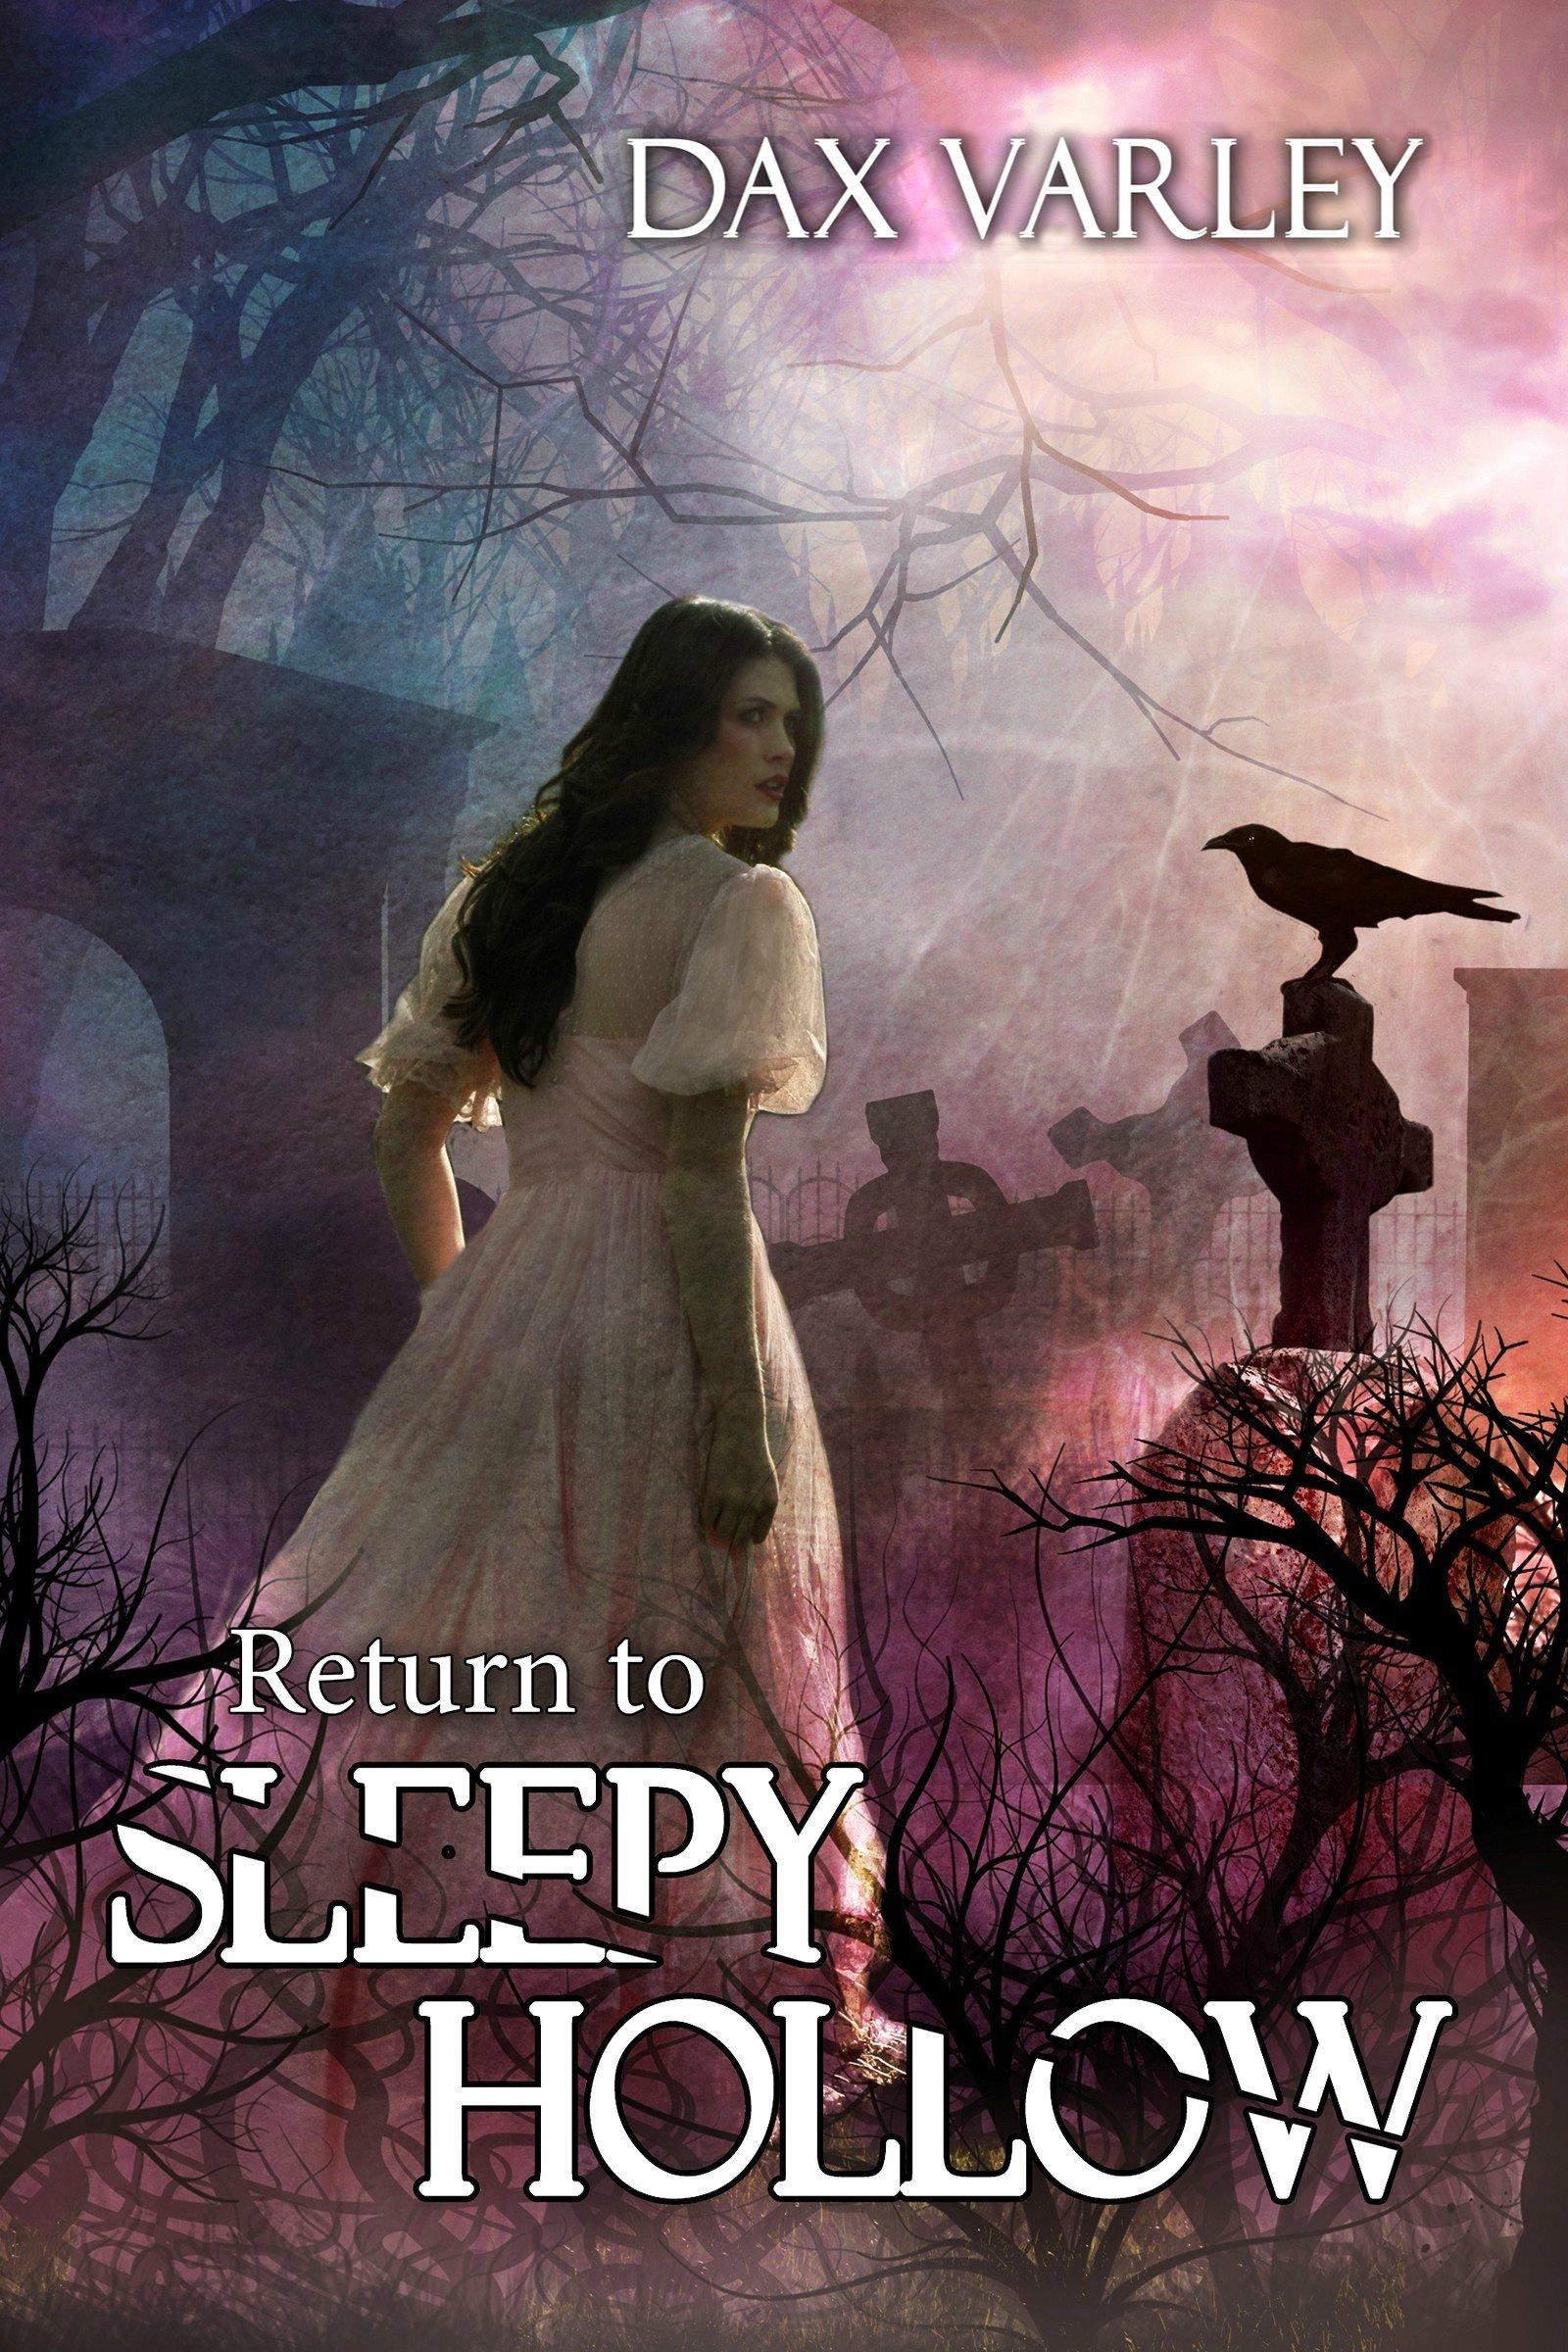 Return to Sleepy Hollow (Sleepy Hollow #2)